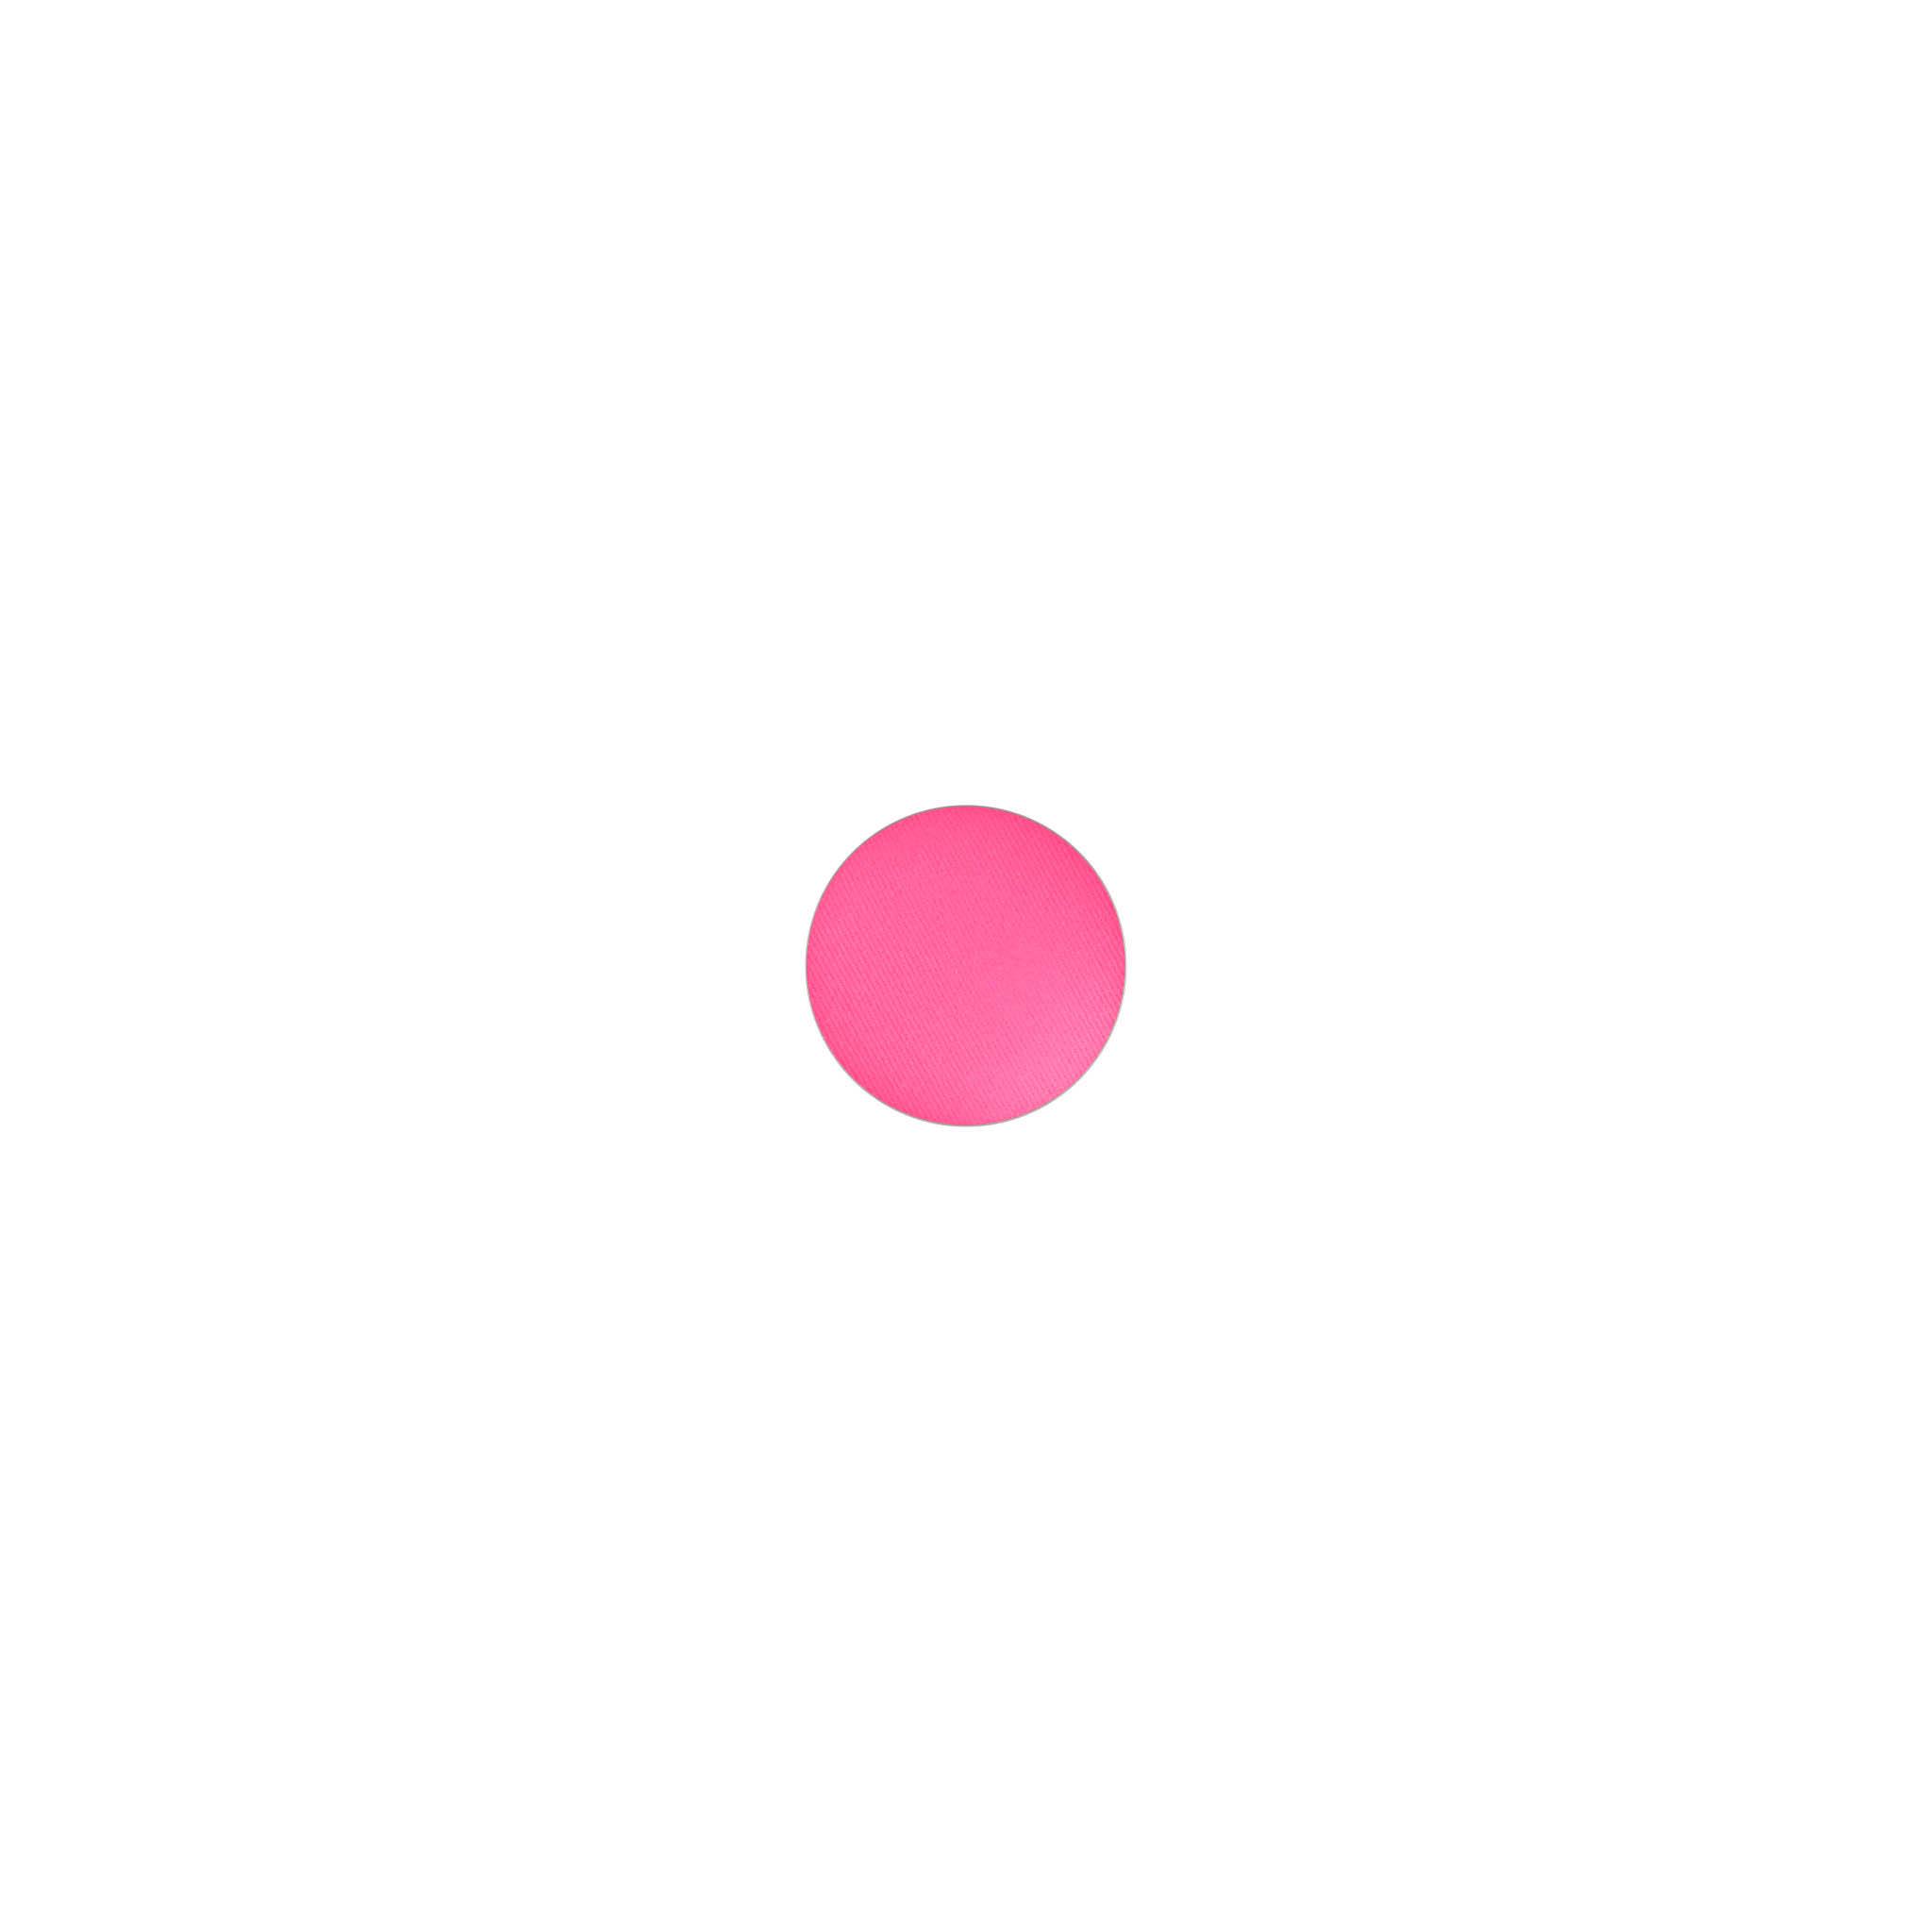 Powder Blush Pro Palette Bright Pink